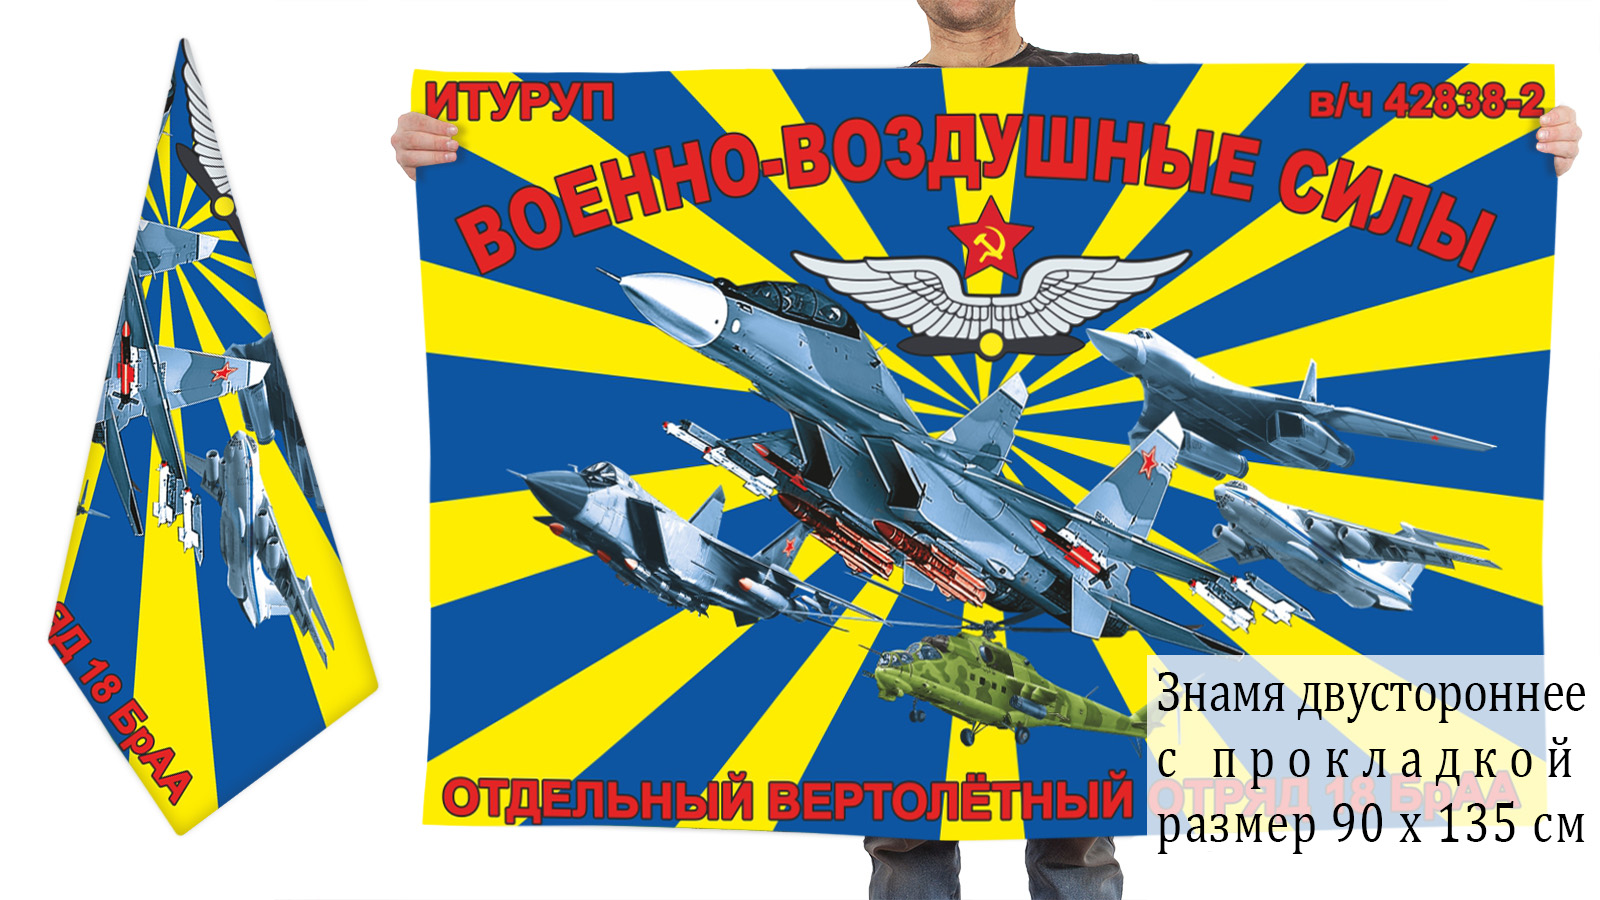 Двусторонний флаг отдельного вертолётного отряда 18 бригады АА